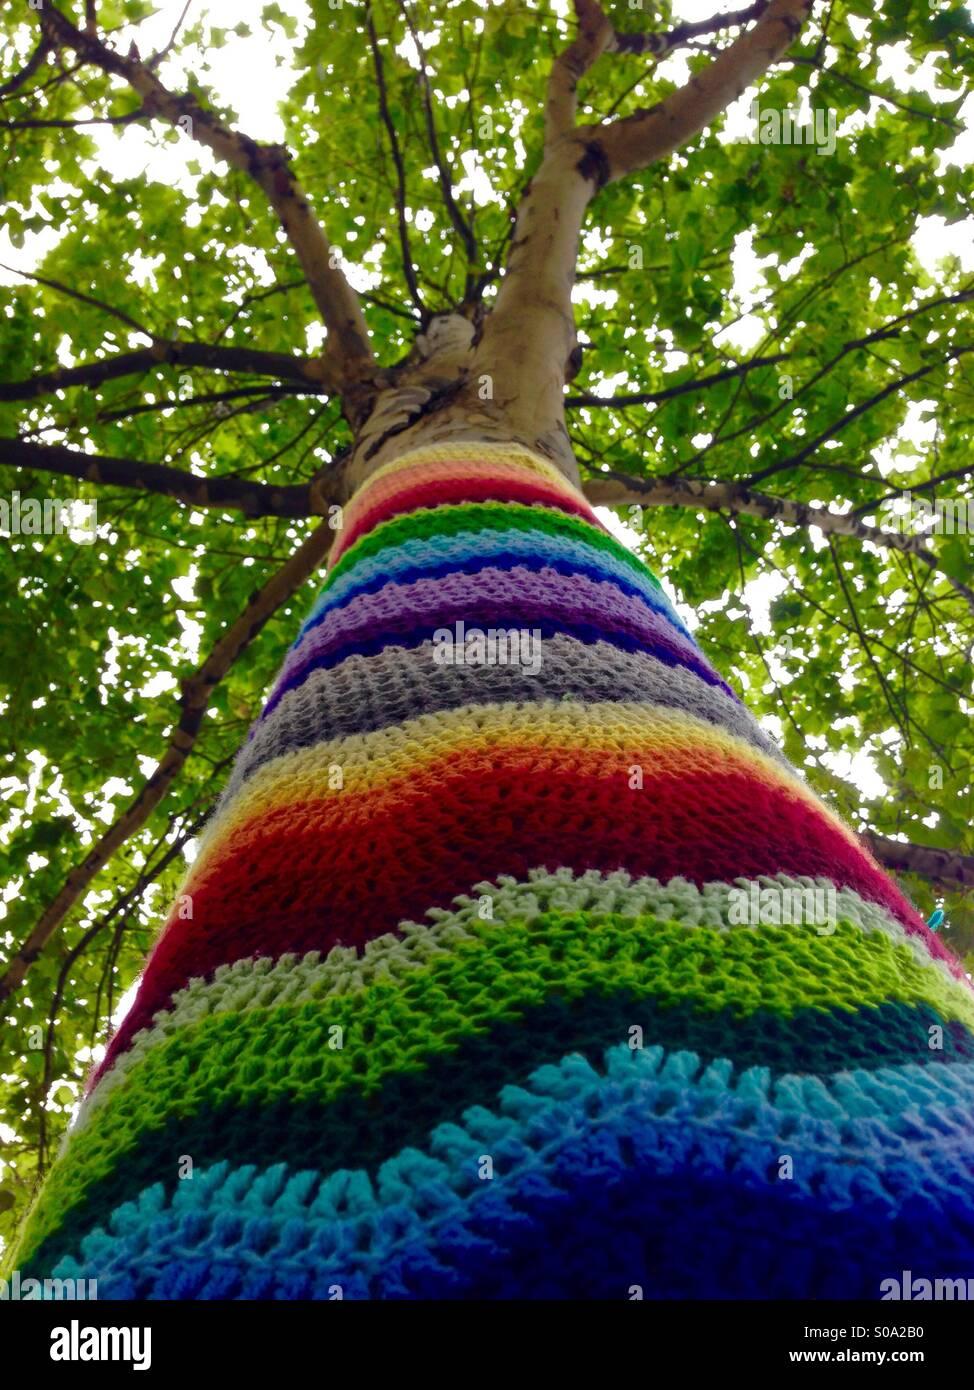 Tree with crochet rainbow on trunk - Stock Image